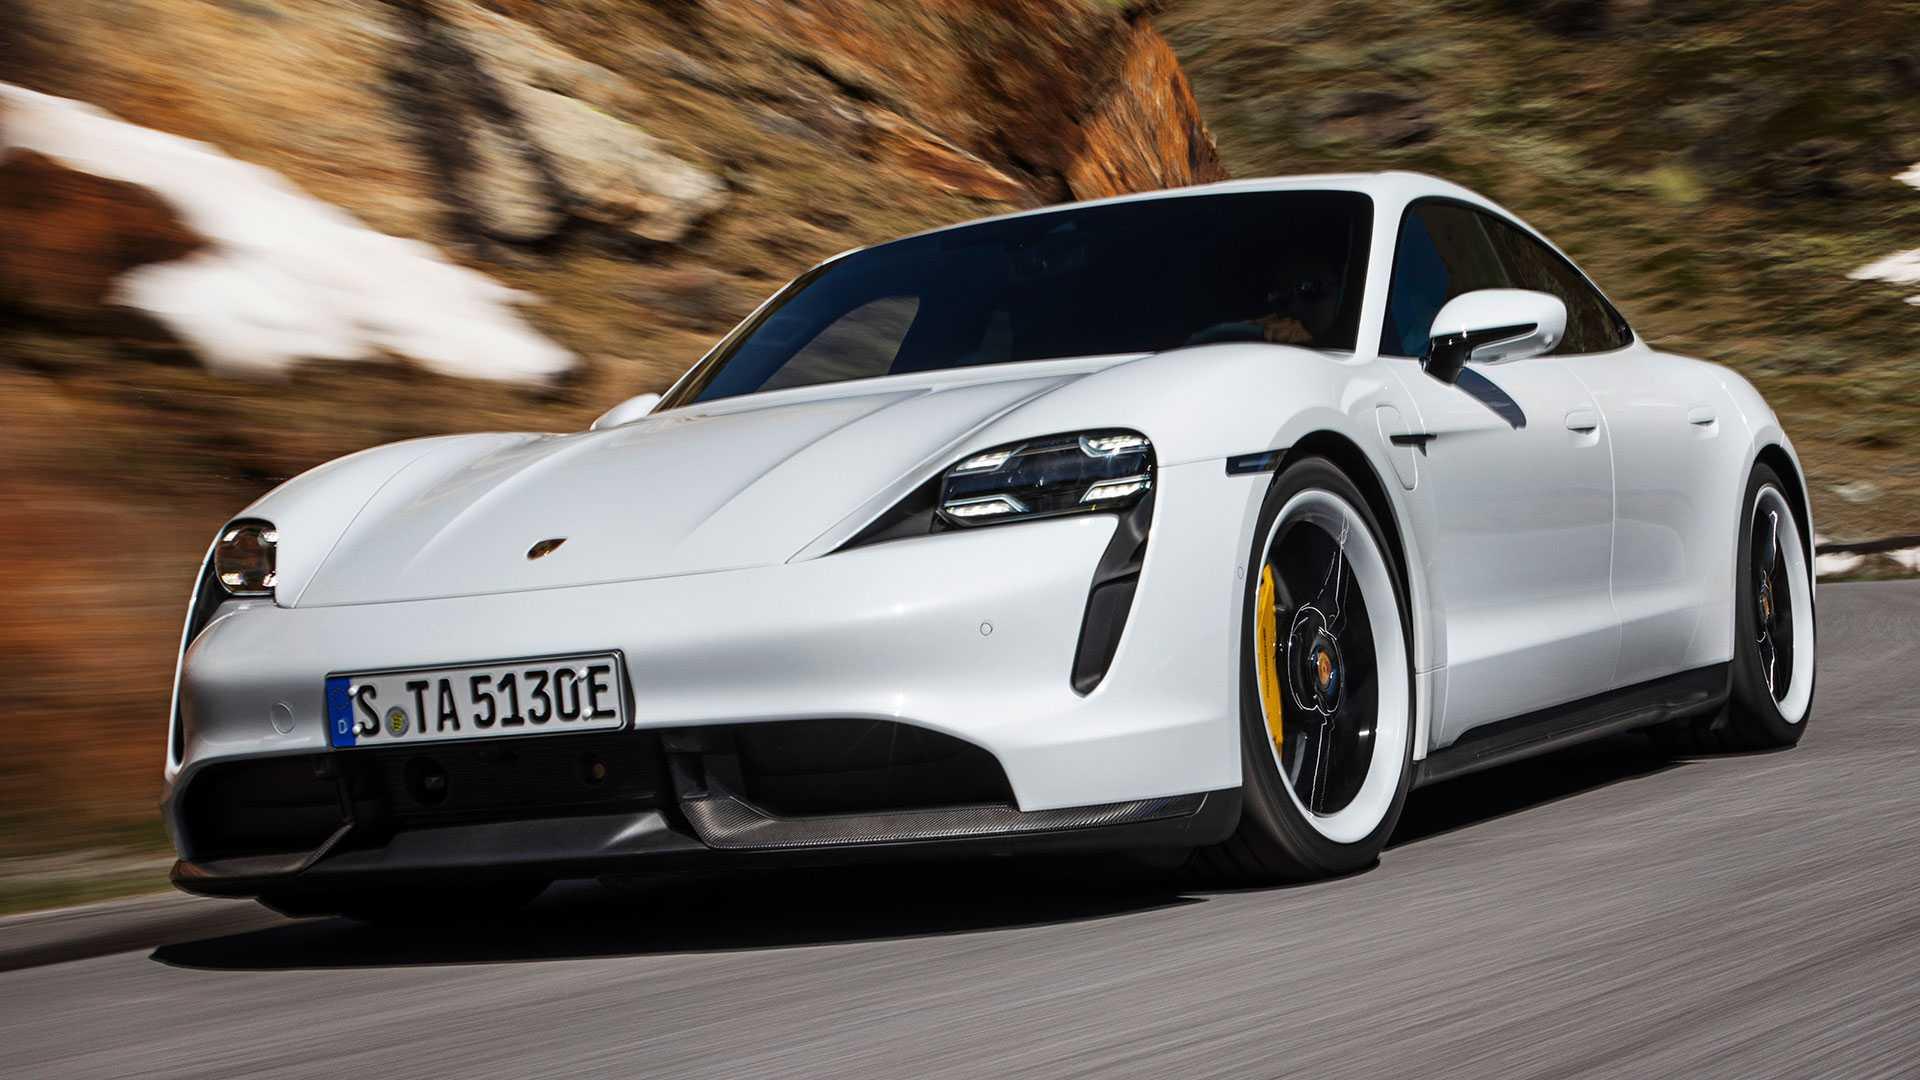 2020 Porsche Taycan Debuts As An All Electric Super Sedan 1920x1080